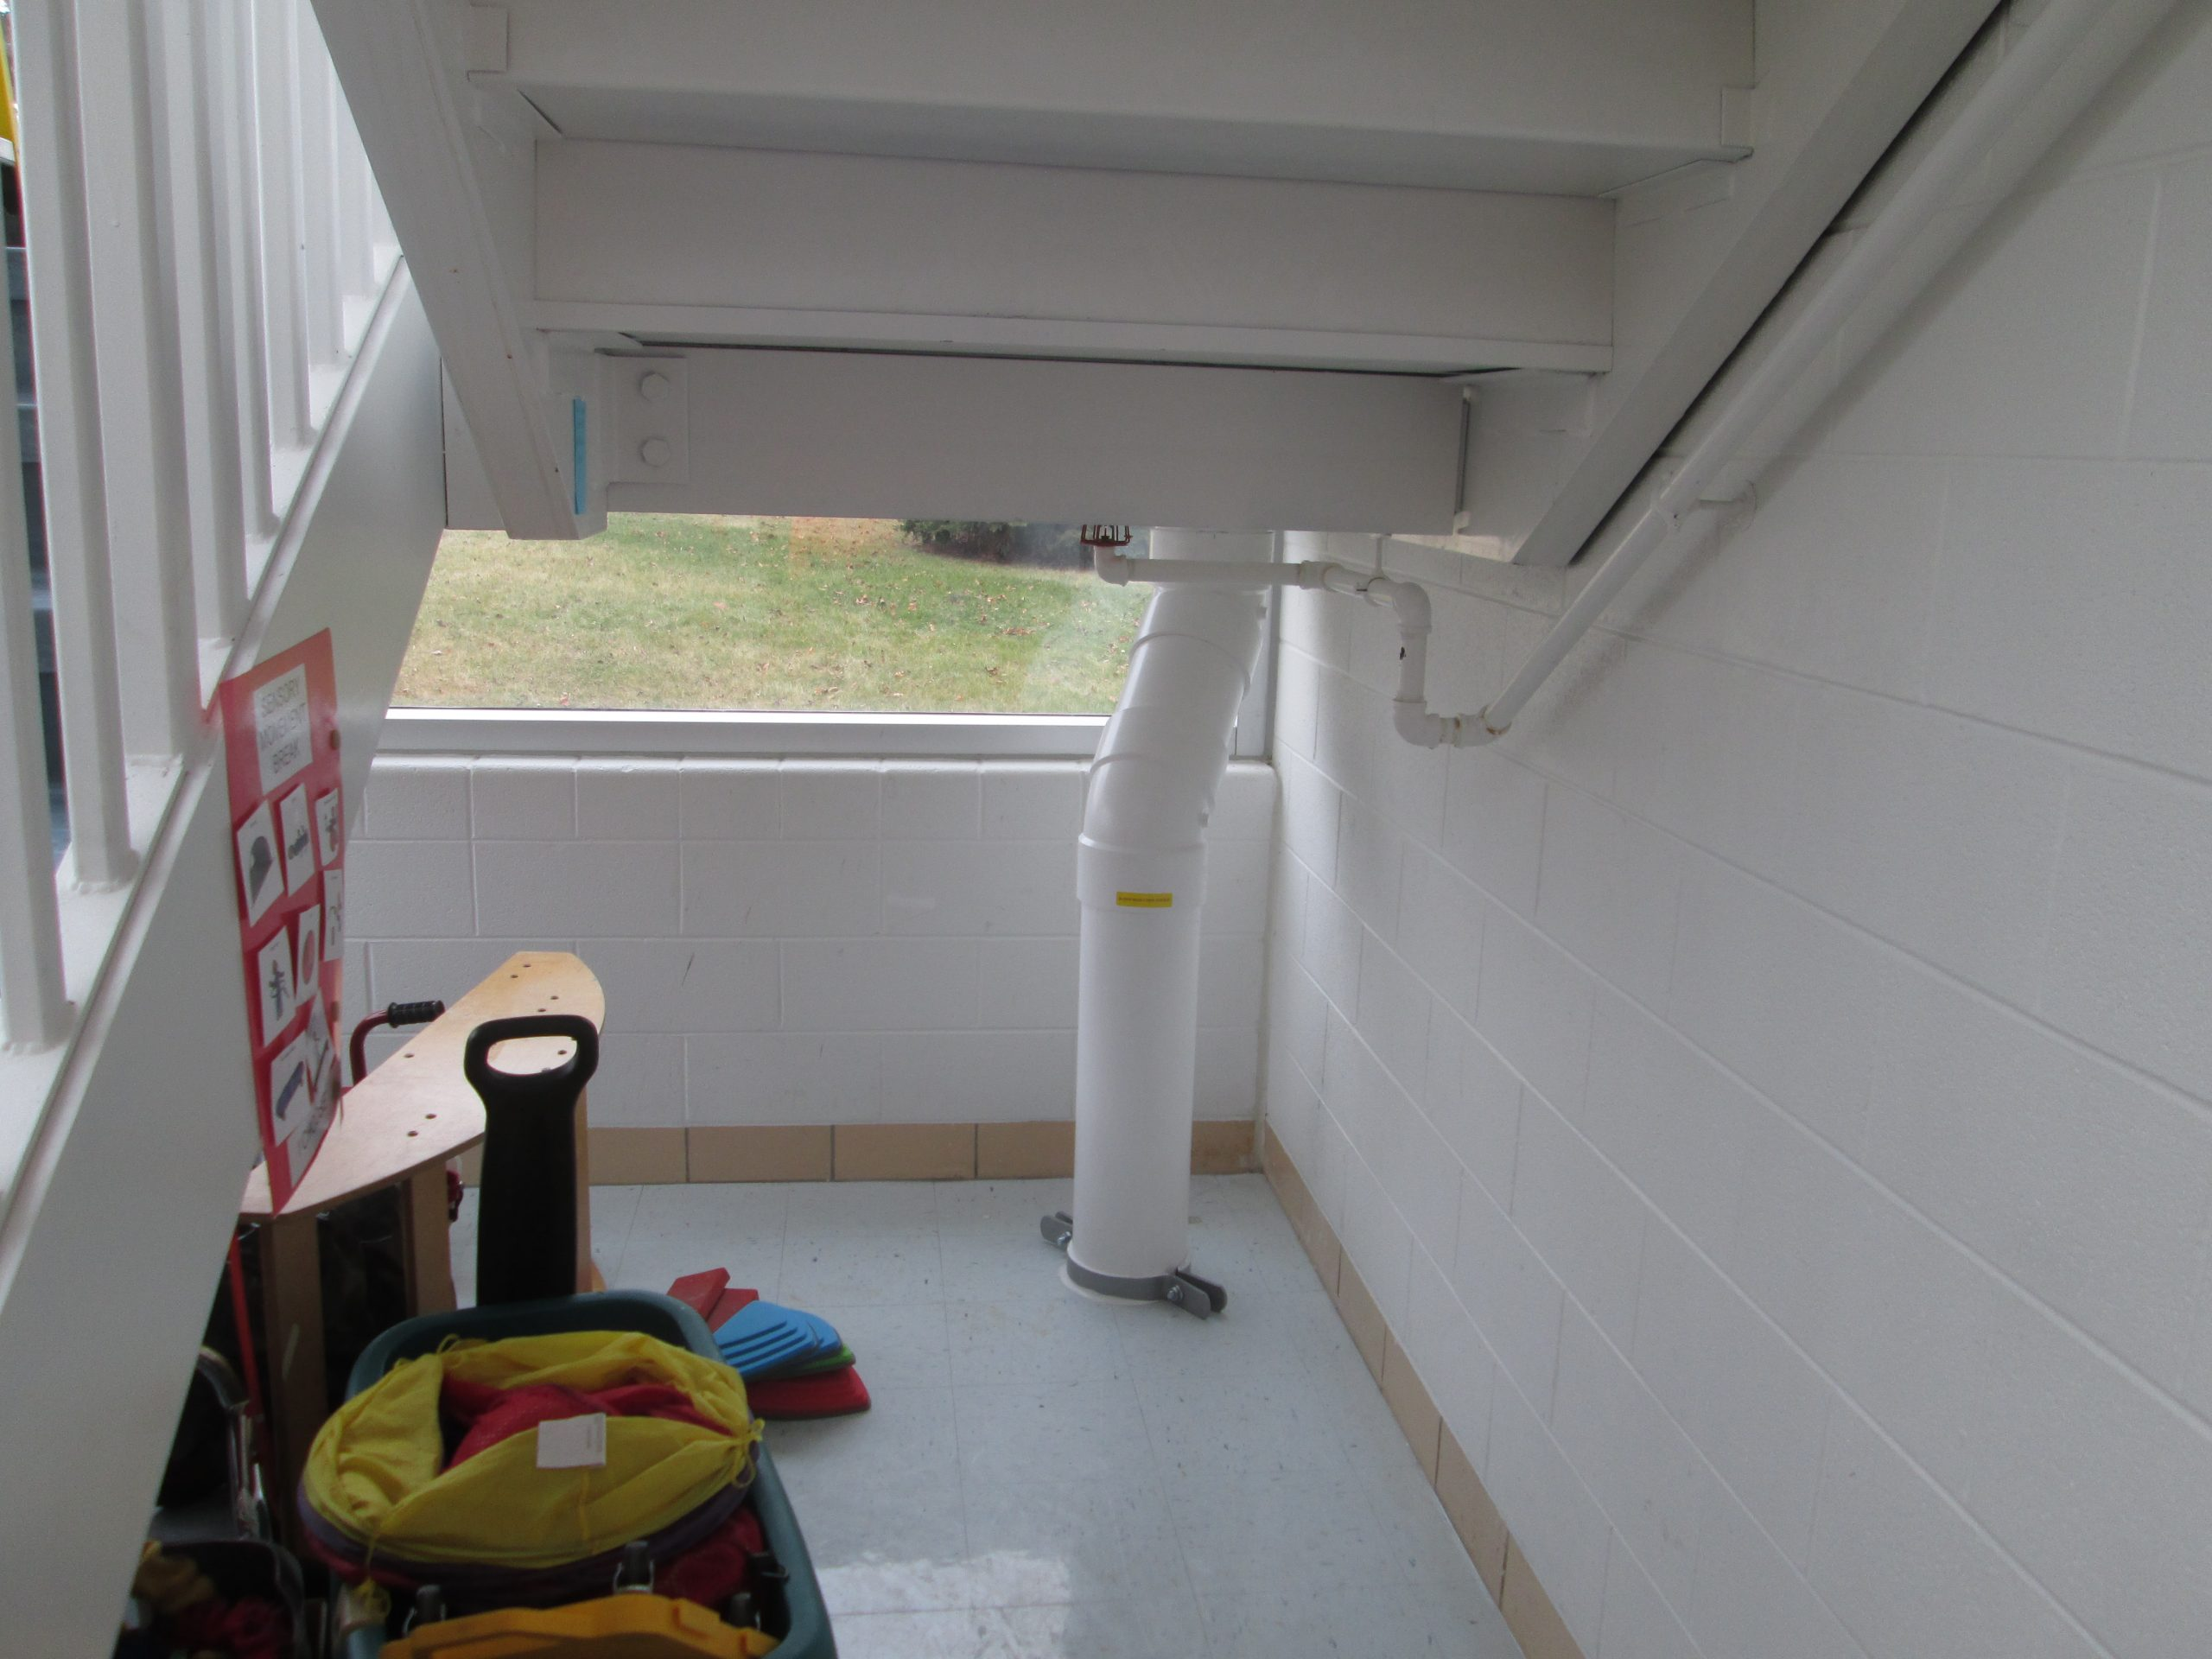 radon-mitigation-system-school-11